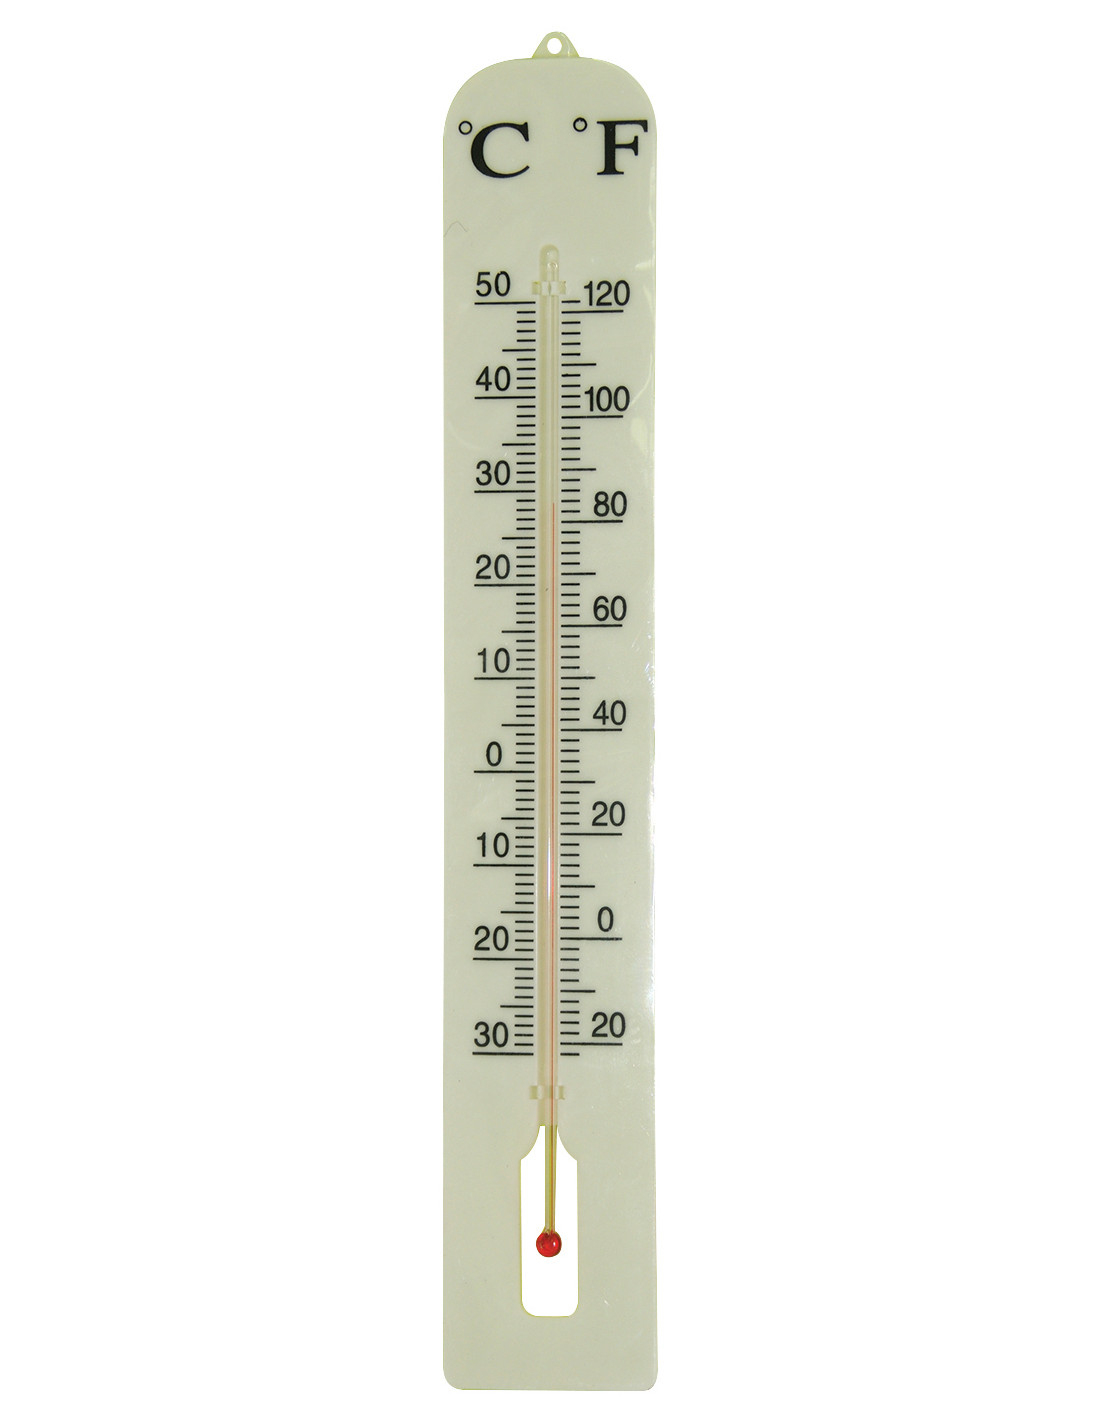 Diffusion Thermomètre De Jardin 6,5 X H. 40 Cm à Thermometre De Jardin